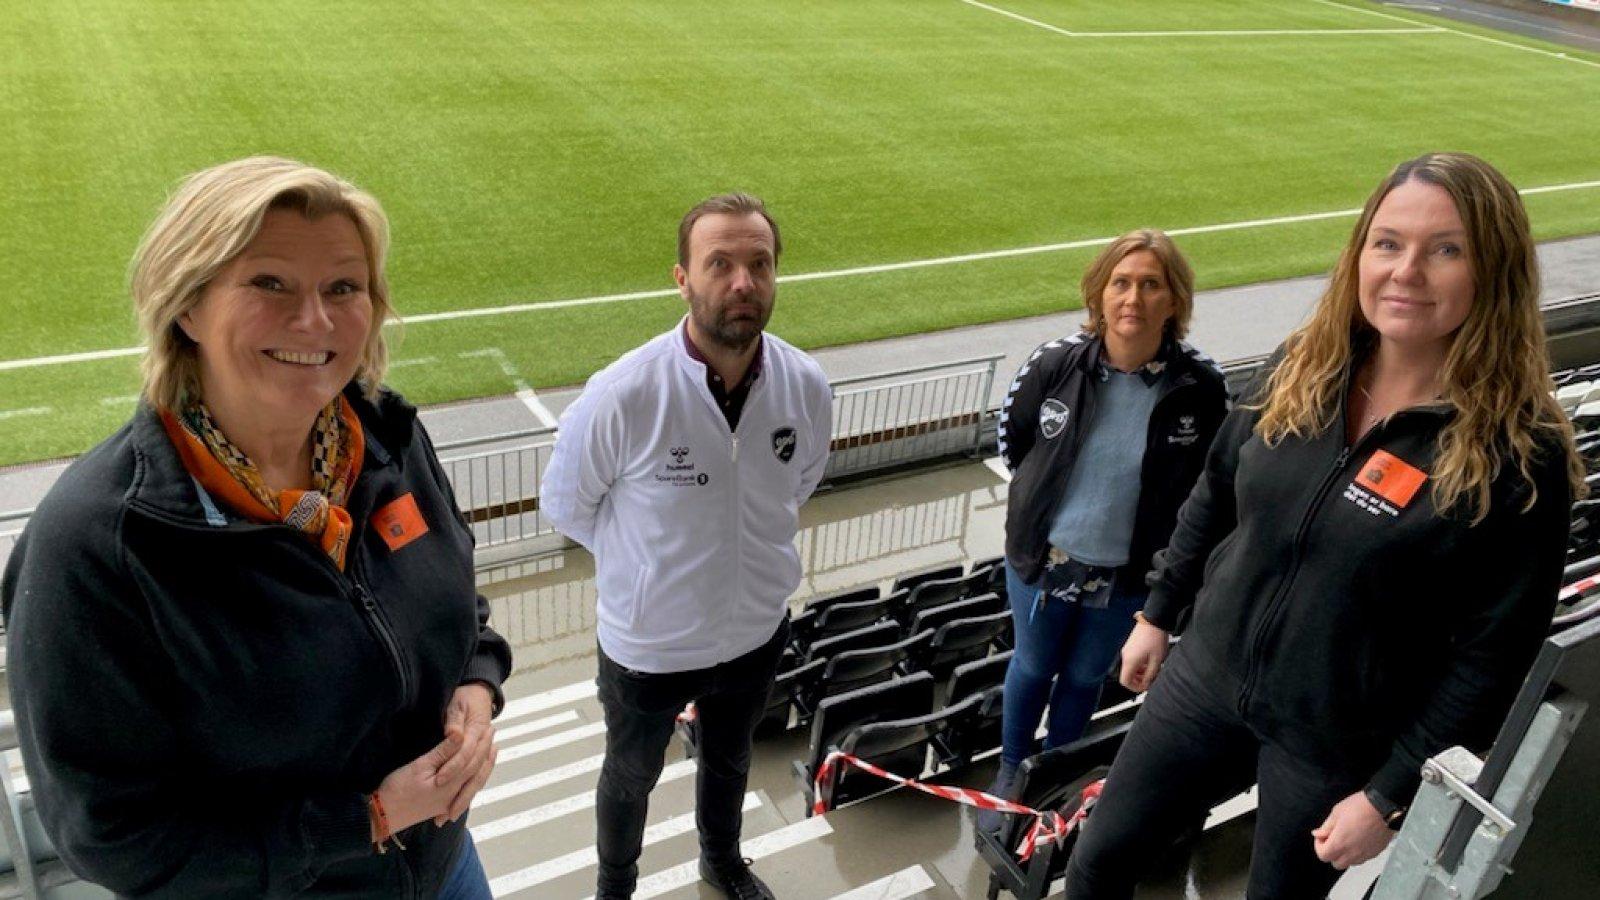 Fra venstre Signe Tynning, Einar Håndlykken, Line Refsdal og Nina Meling Haugen